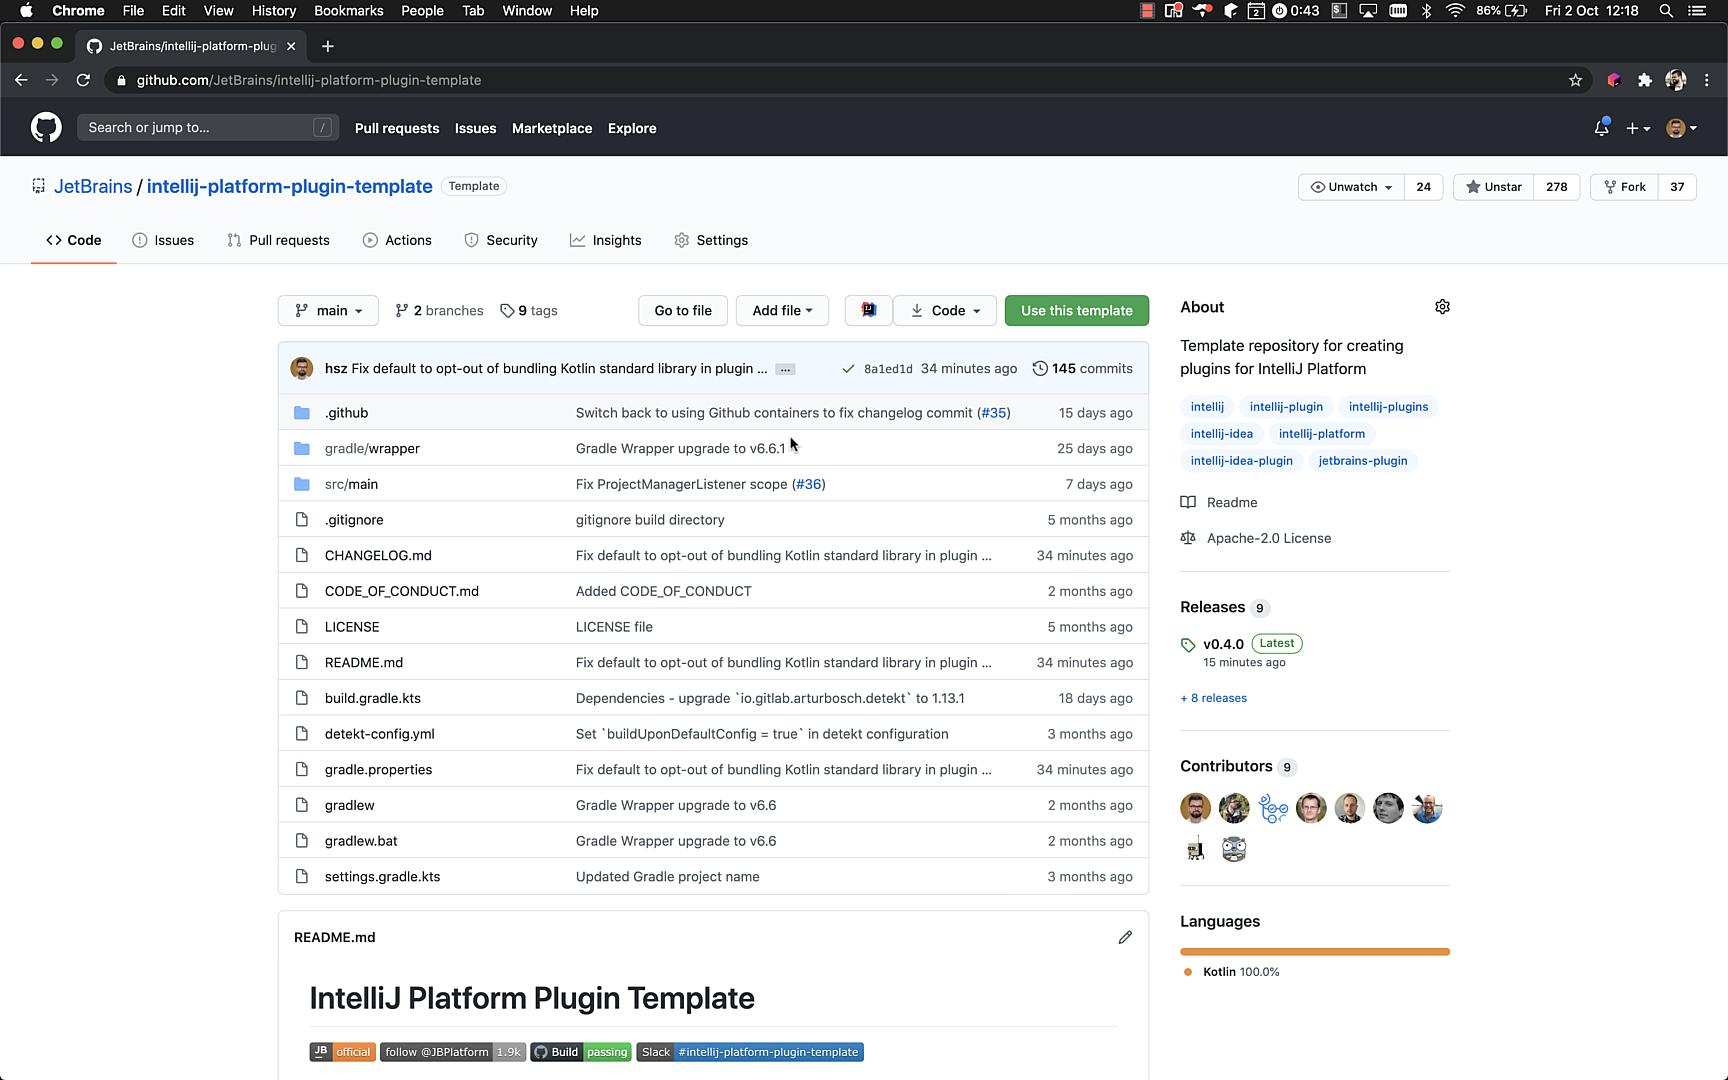 IntelliJ Platform Plugin Template